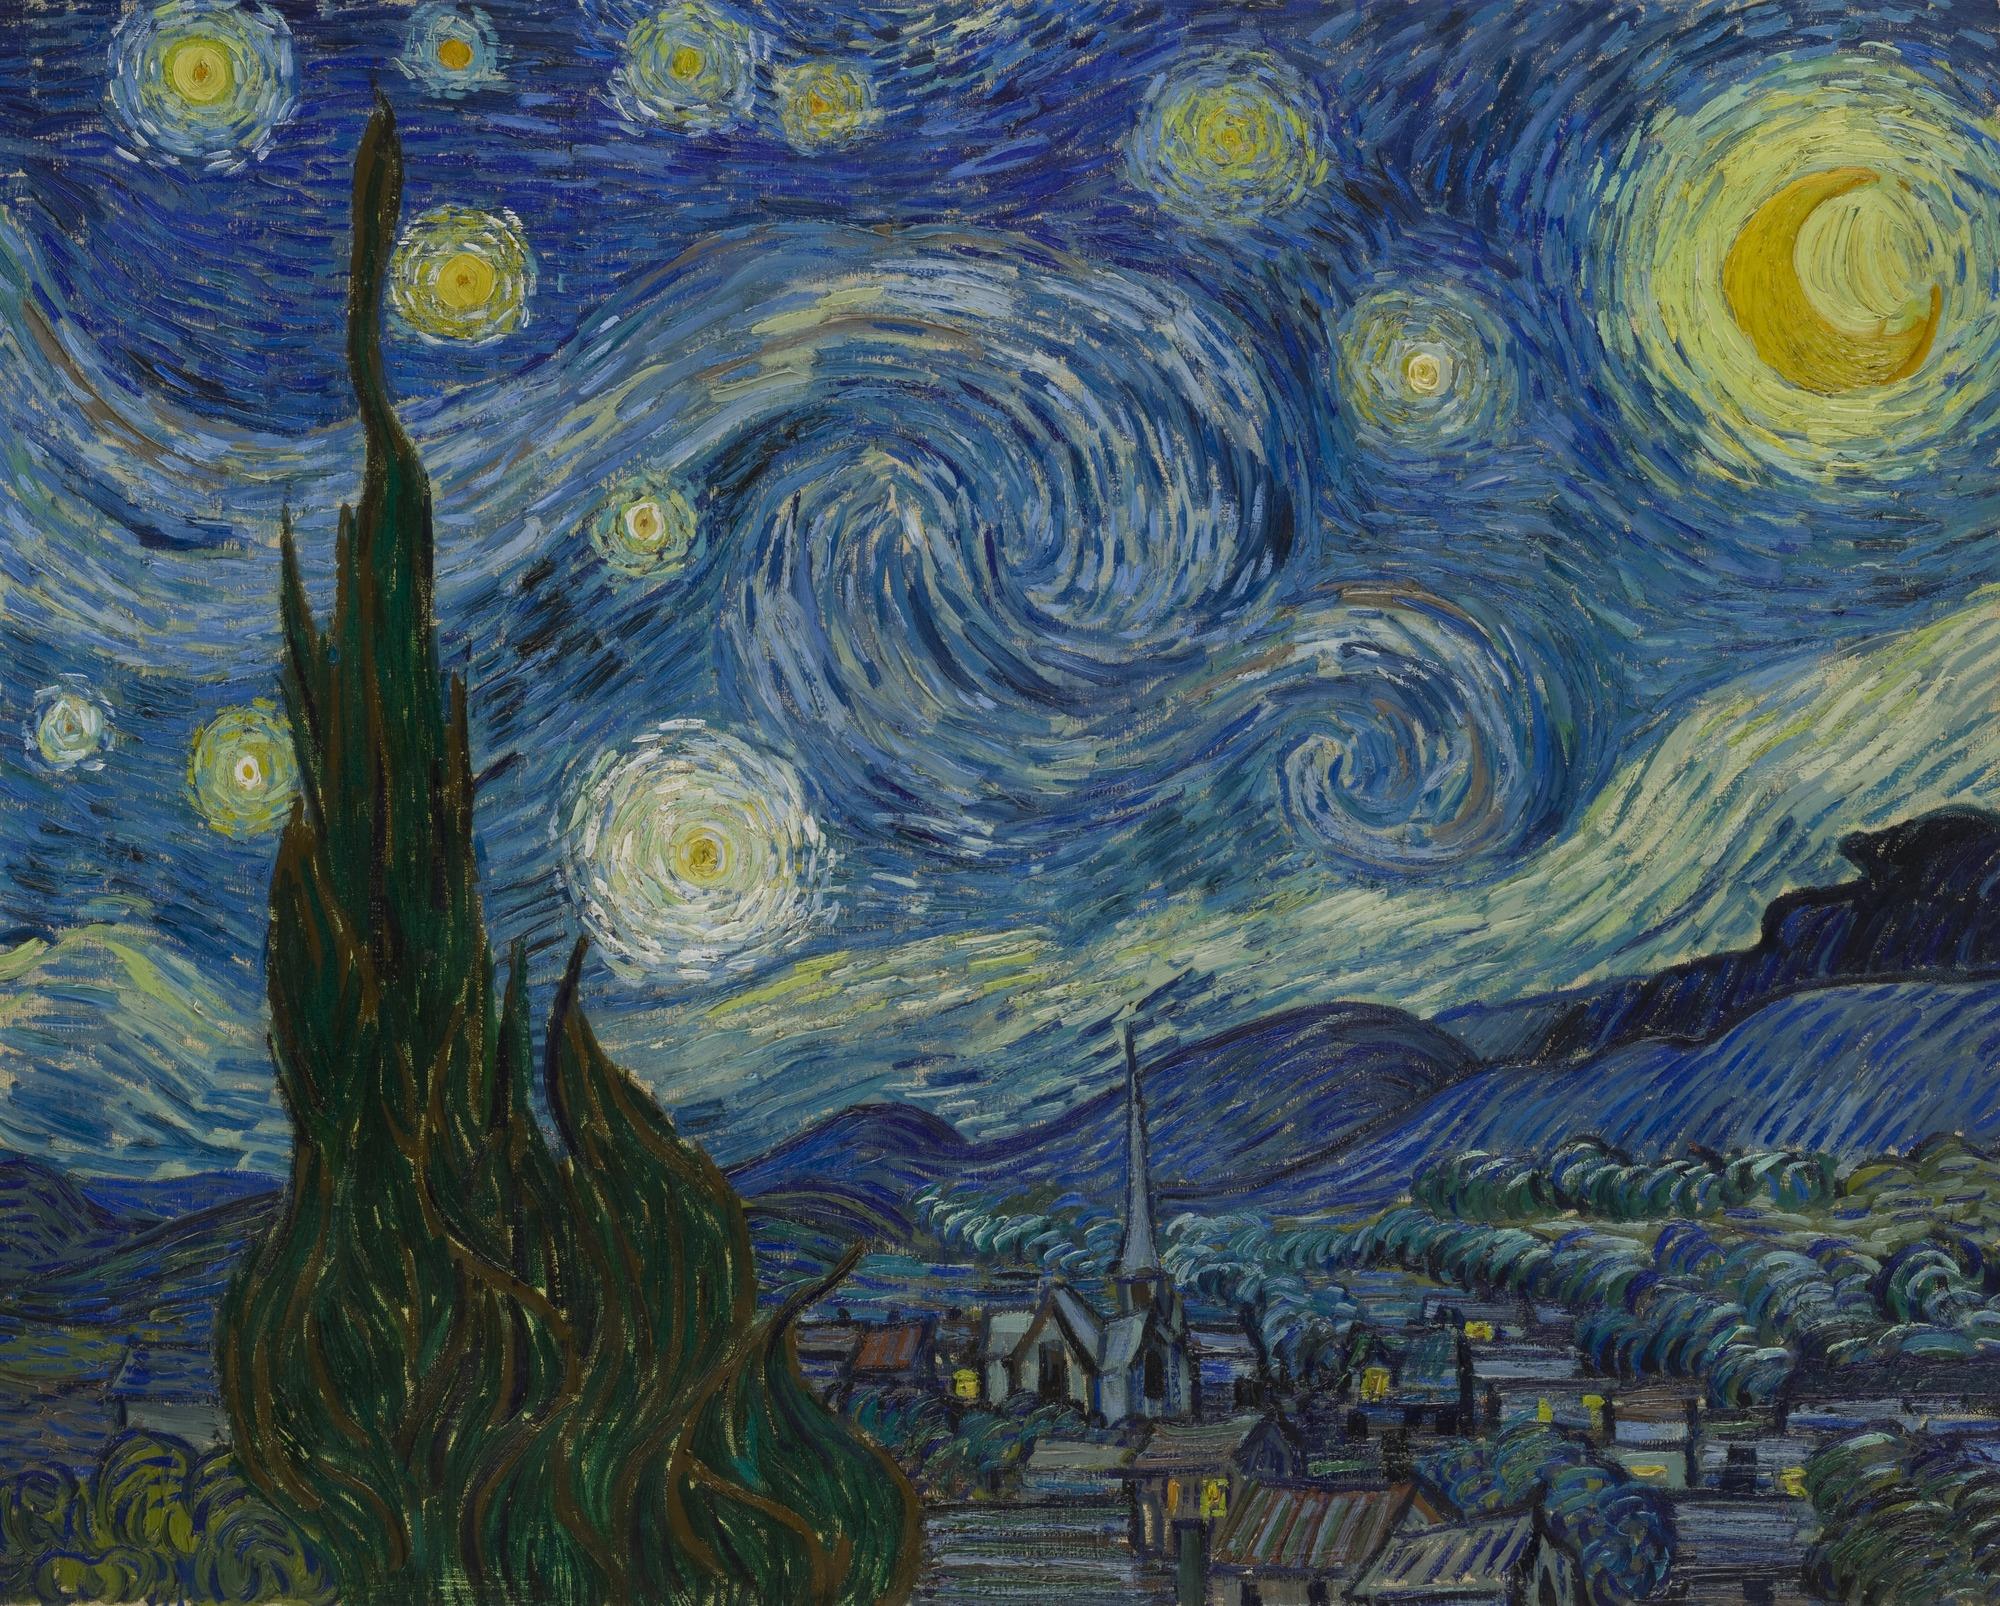 Vincent van Gogh -  The Starry Night   Saint Rémy, June 1889